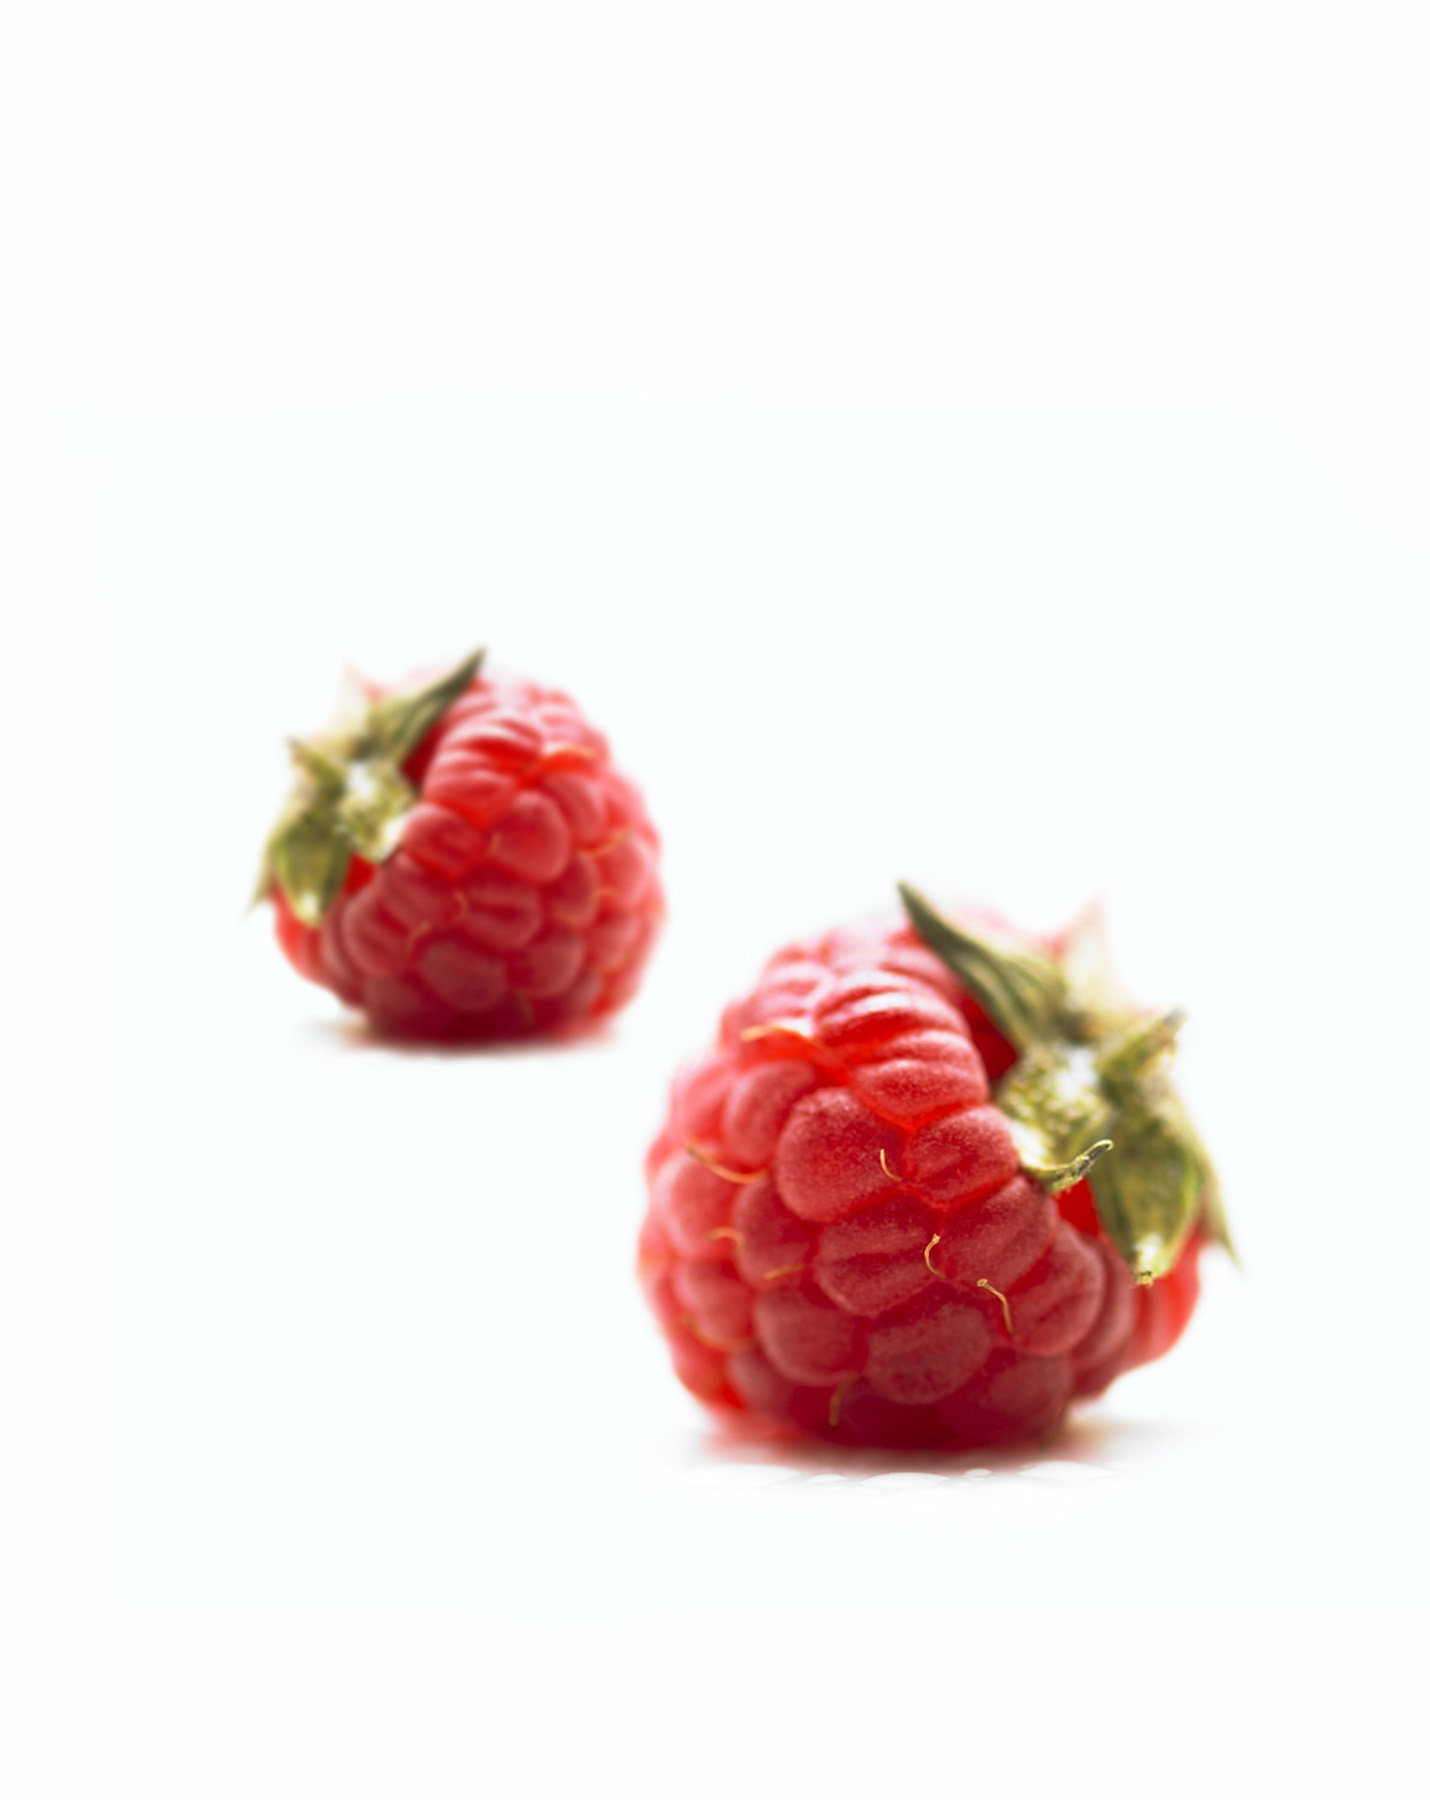 21-icon-artist-management-katie-hammond-food_waitrose_raspberries.jpg